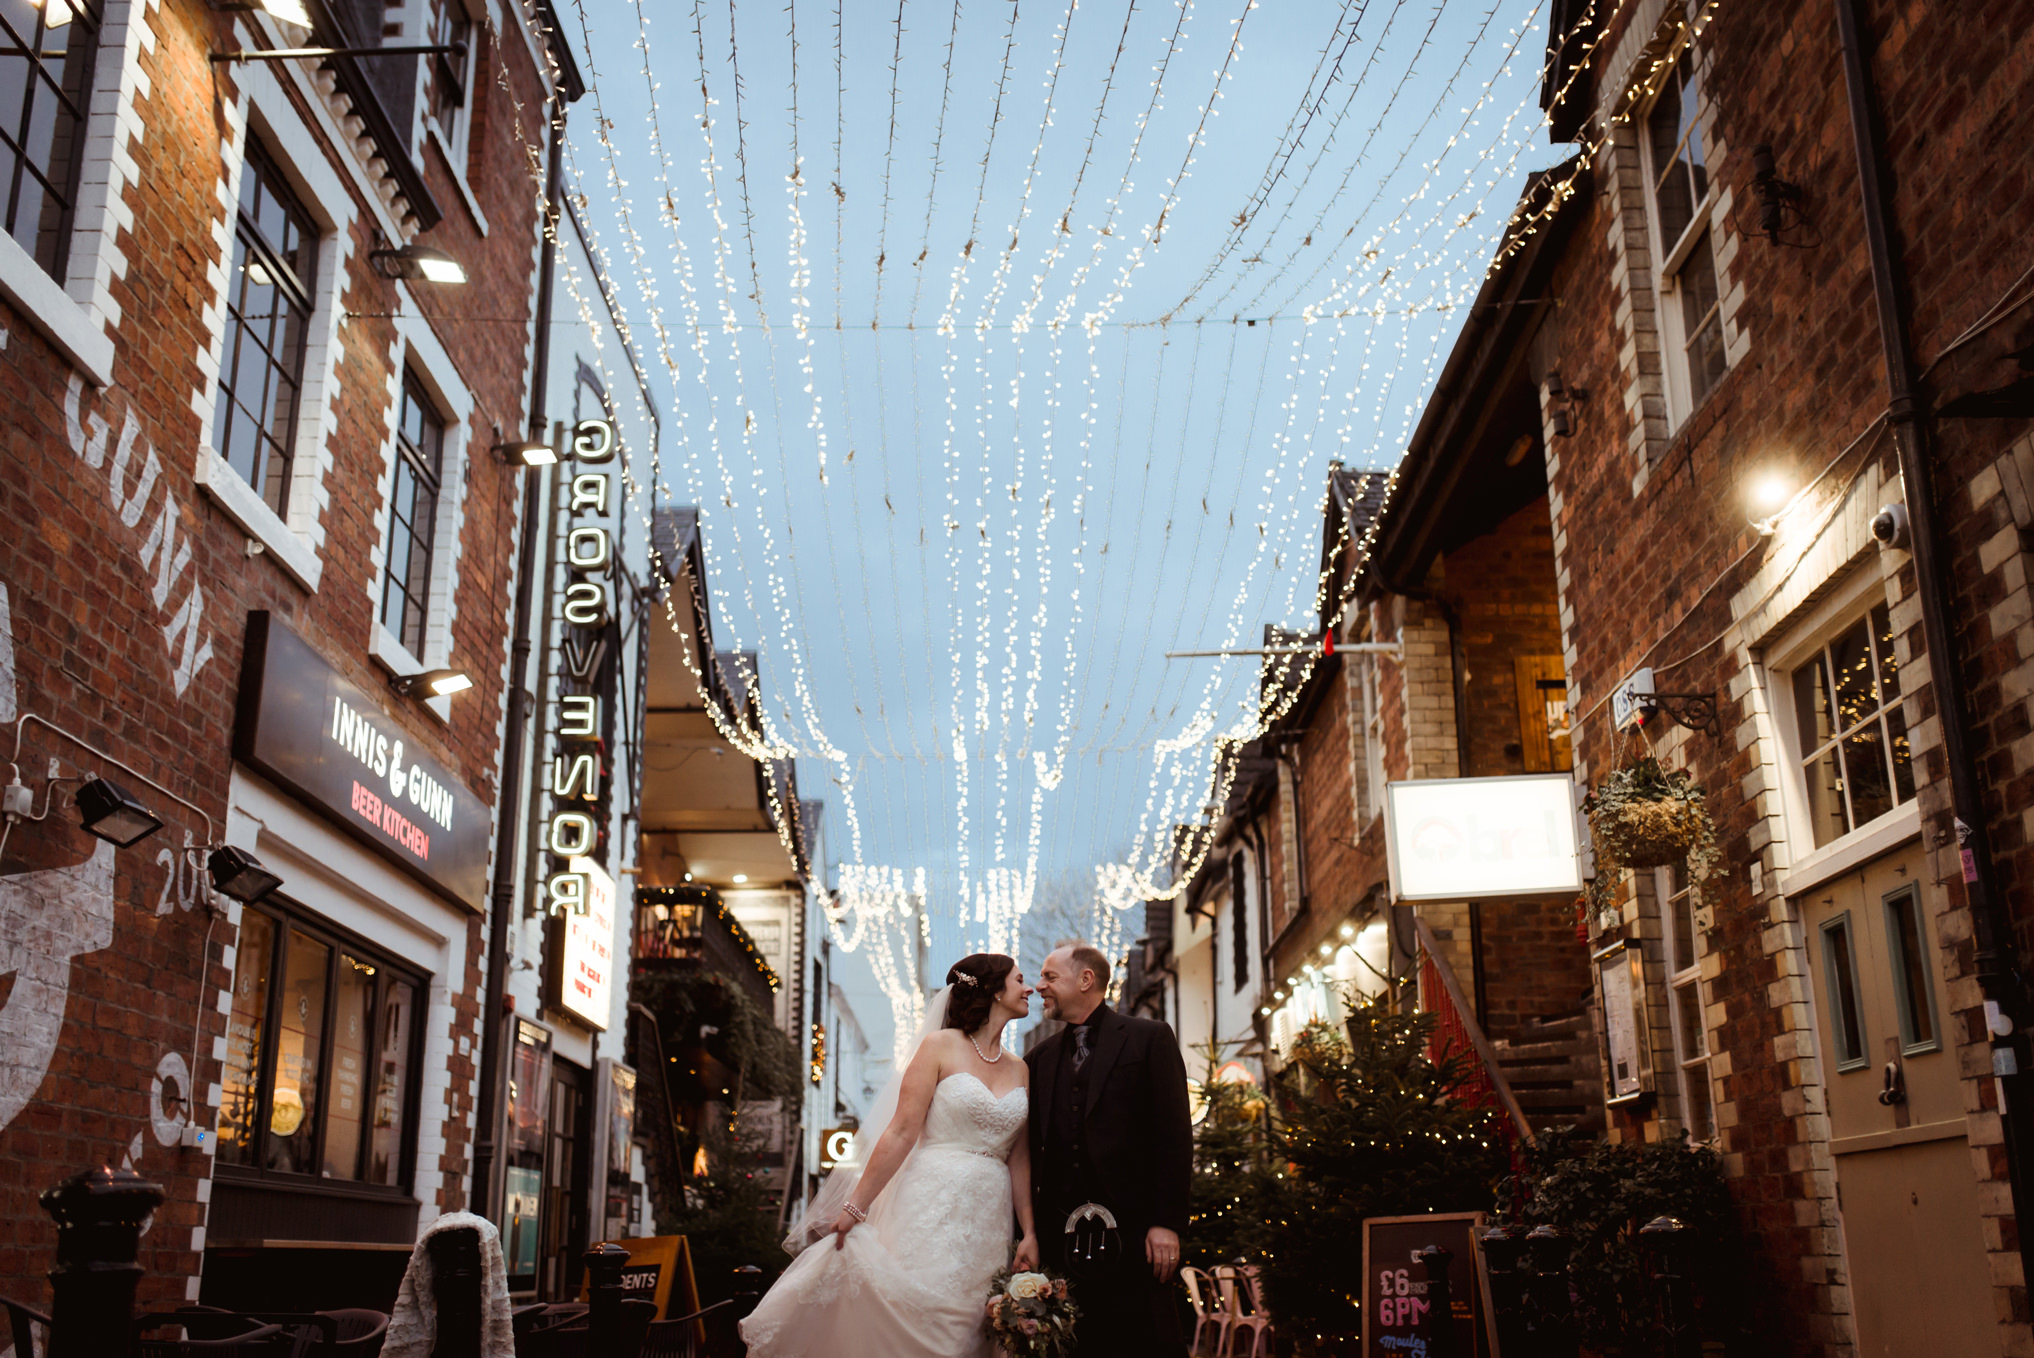 ashton-lane-wedding-photography.jpg